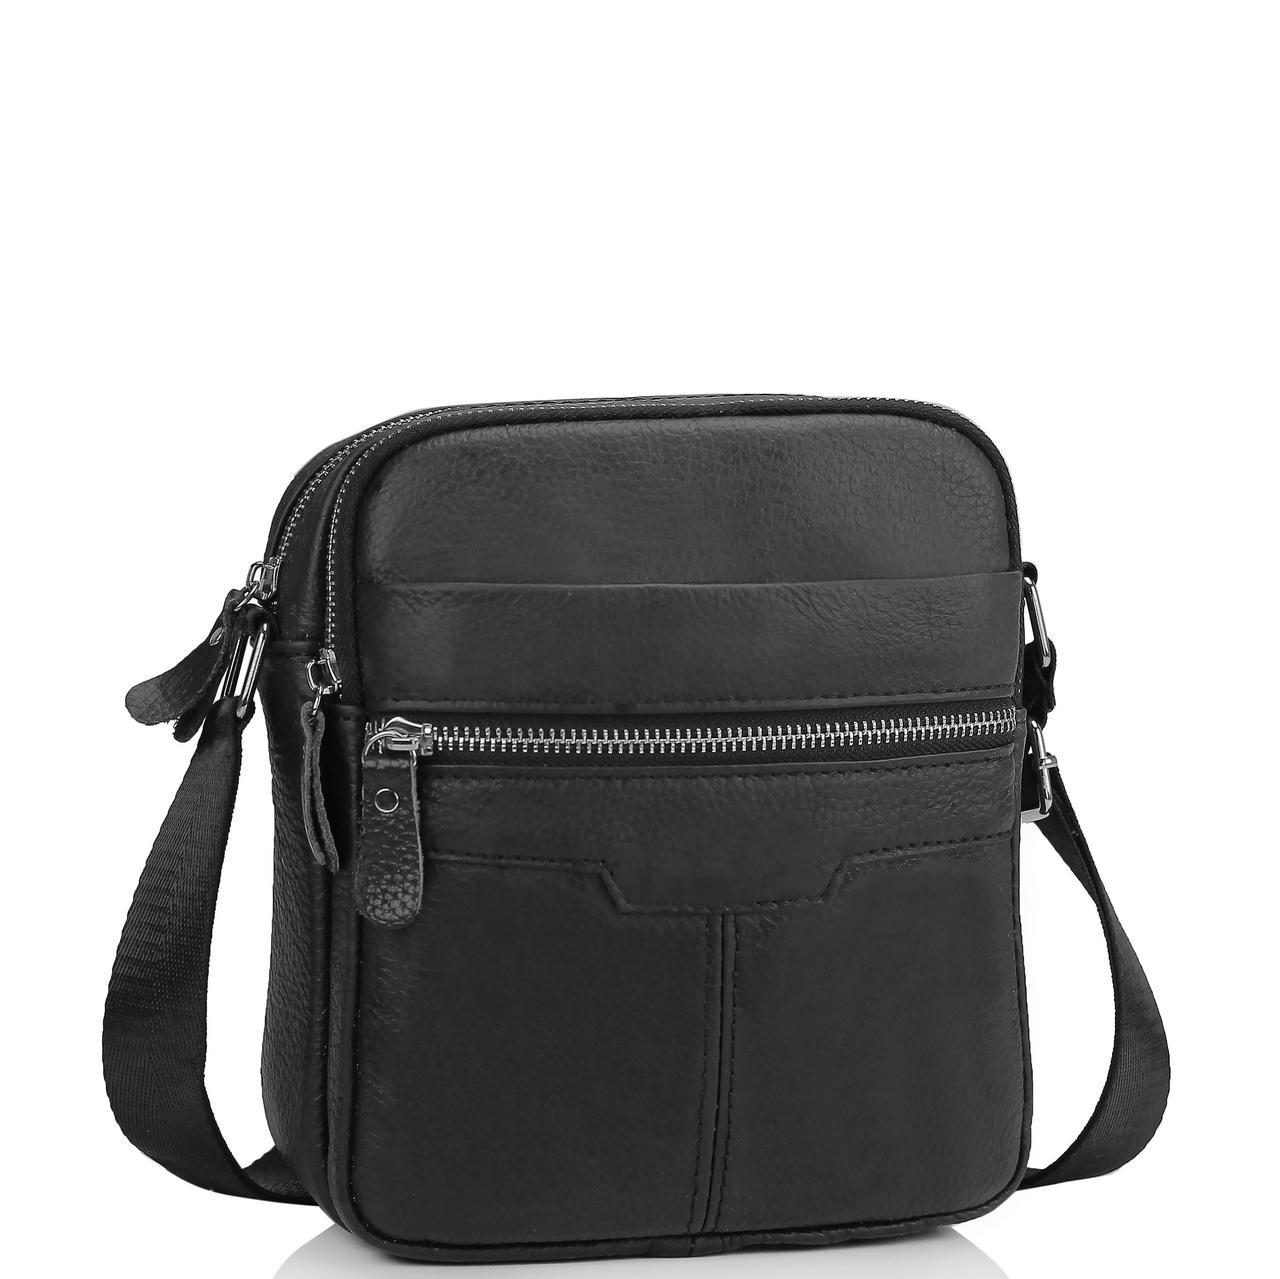 Чоловіча шкіряна сумка через плече маленька Tiding Bag A25F-6625A